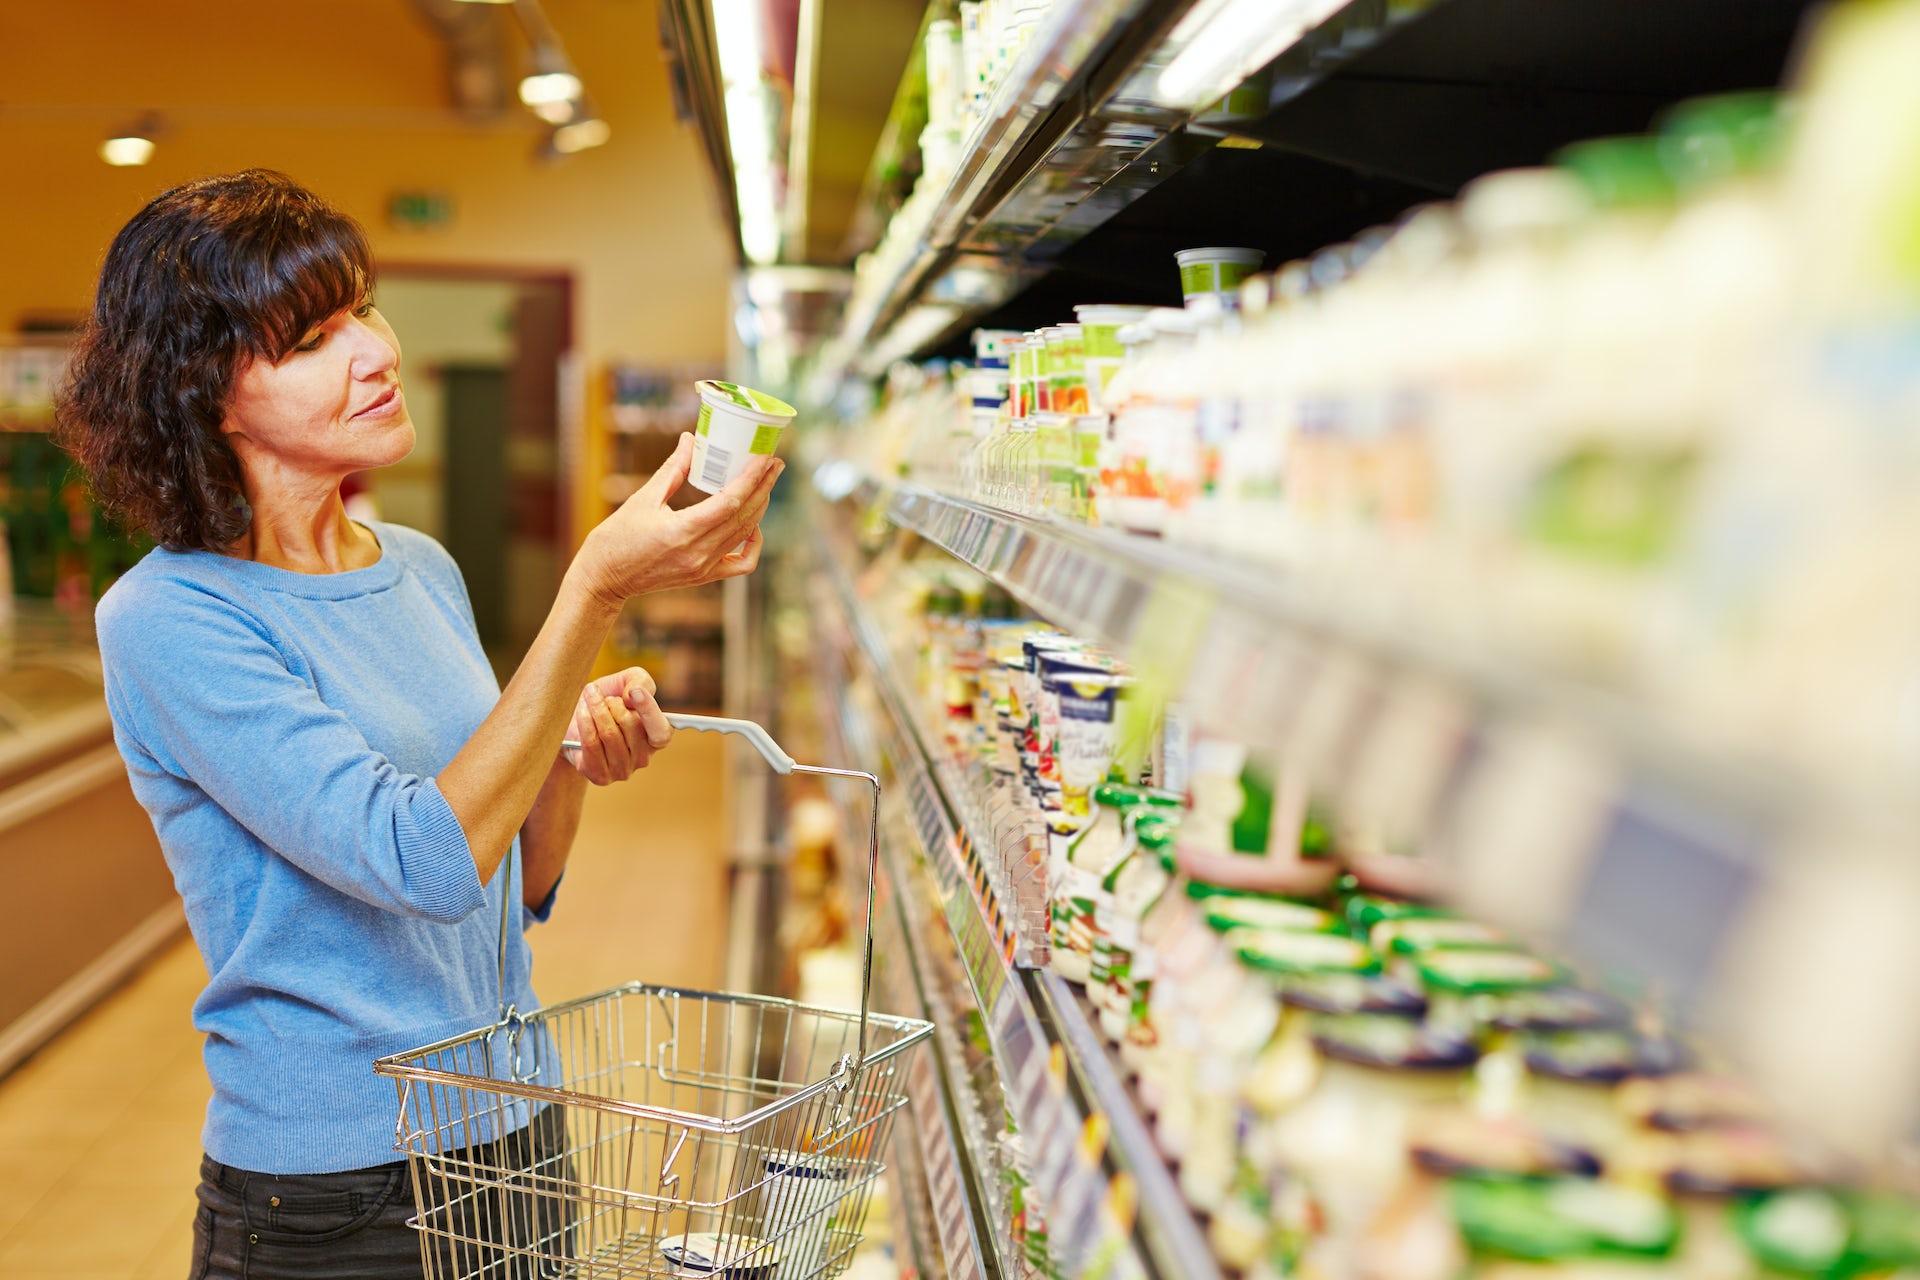 Plain, Greek, low-fat? How to choose a healthy yoghurt